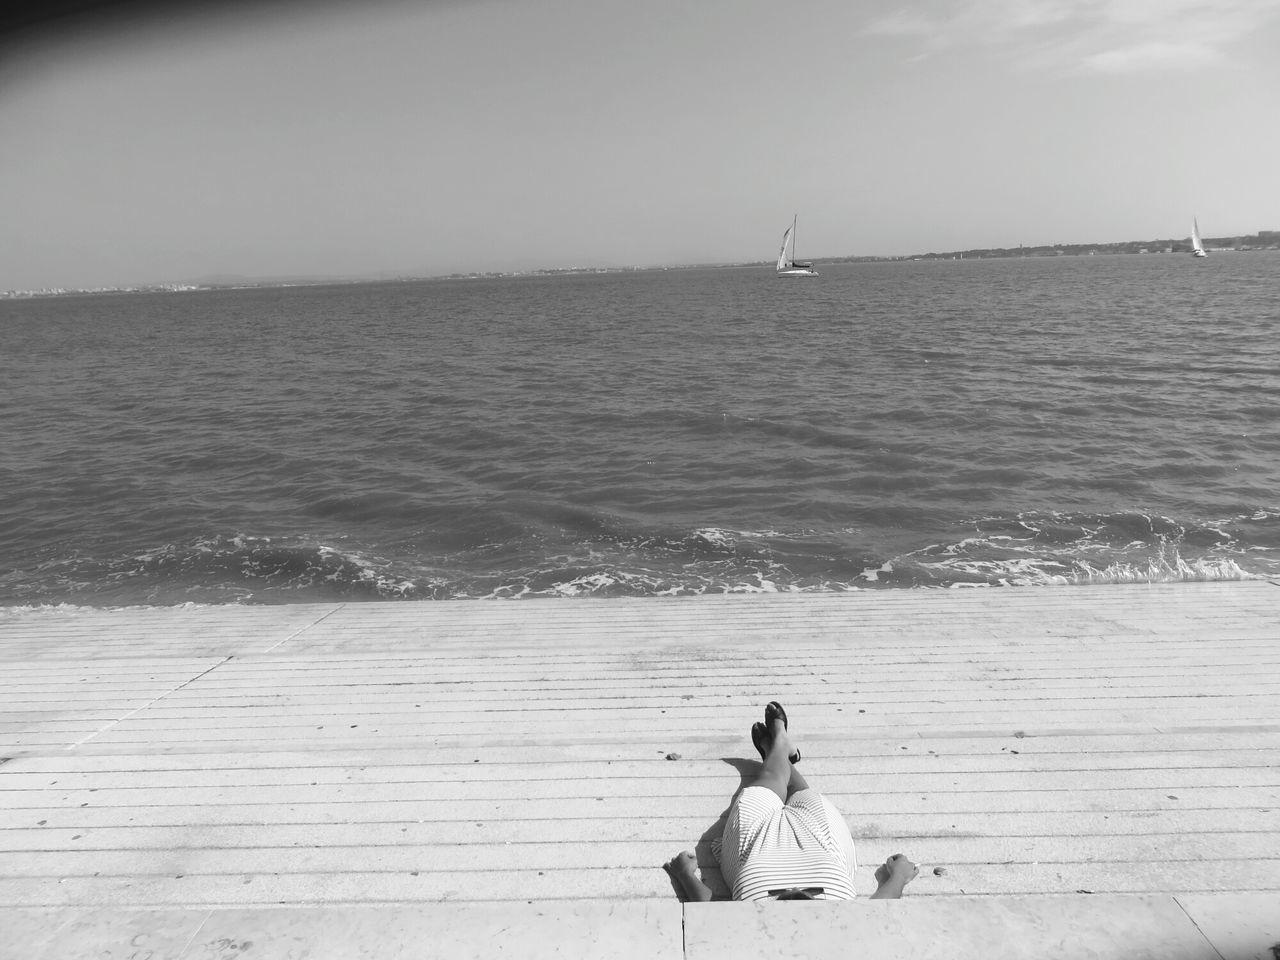 Solitude... Blackandwhite Tinycollective Vogue Lesphotographes Lensculture Lensculturestreets Lenscultureportrait Noiretblanc, Blackandwhite Eye Em Best Shots Eye4photography  EyeEm Gallery Instagram Pinterest Monochrome Minimalism Photojournalism Life AMPt_community Noir Et Blanc Blancoynegro Hello World Lisboa Lisbon Lisbon City Life Bnw